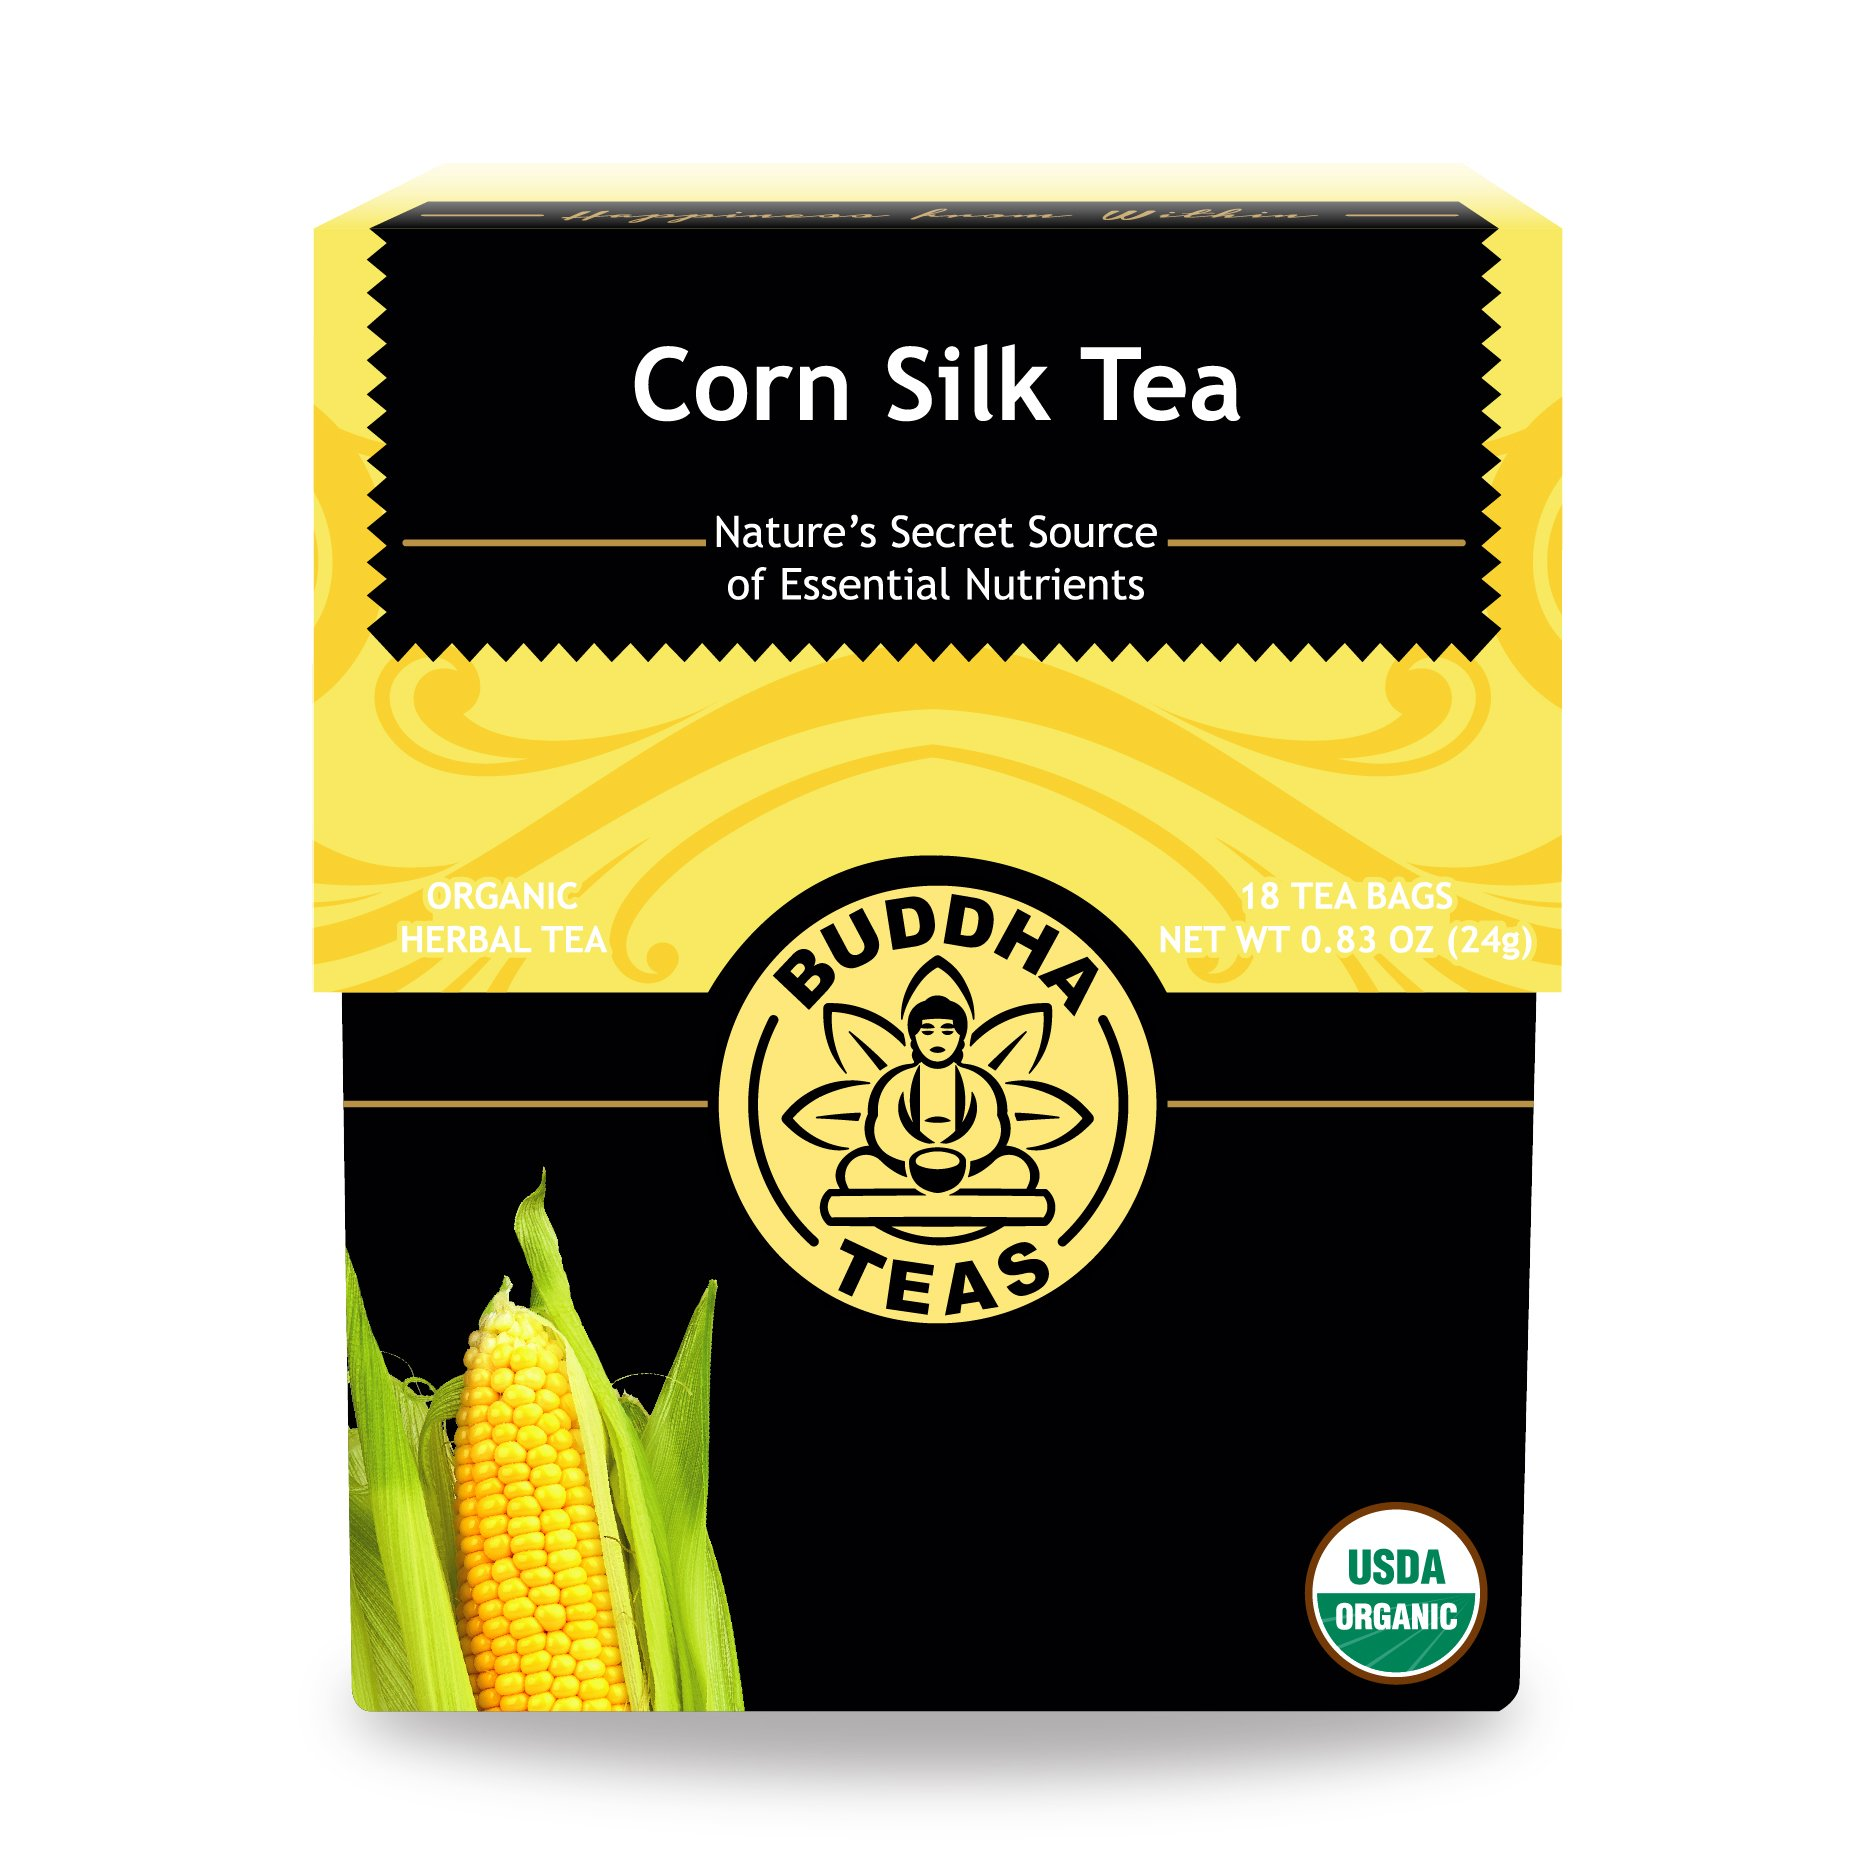 Buddha Teas Organic Corn Silk Tea | 18 Bleach-Free Tea Bags | Supports Urinary Tract Health | Natural Source of Vitamins and Antioxidants | Made in the USA | Caffeine-Free | No GMOs